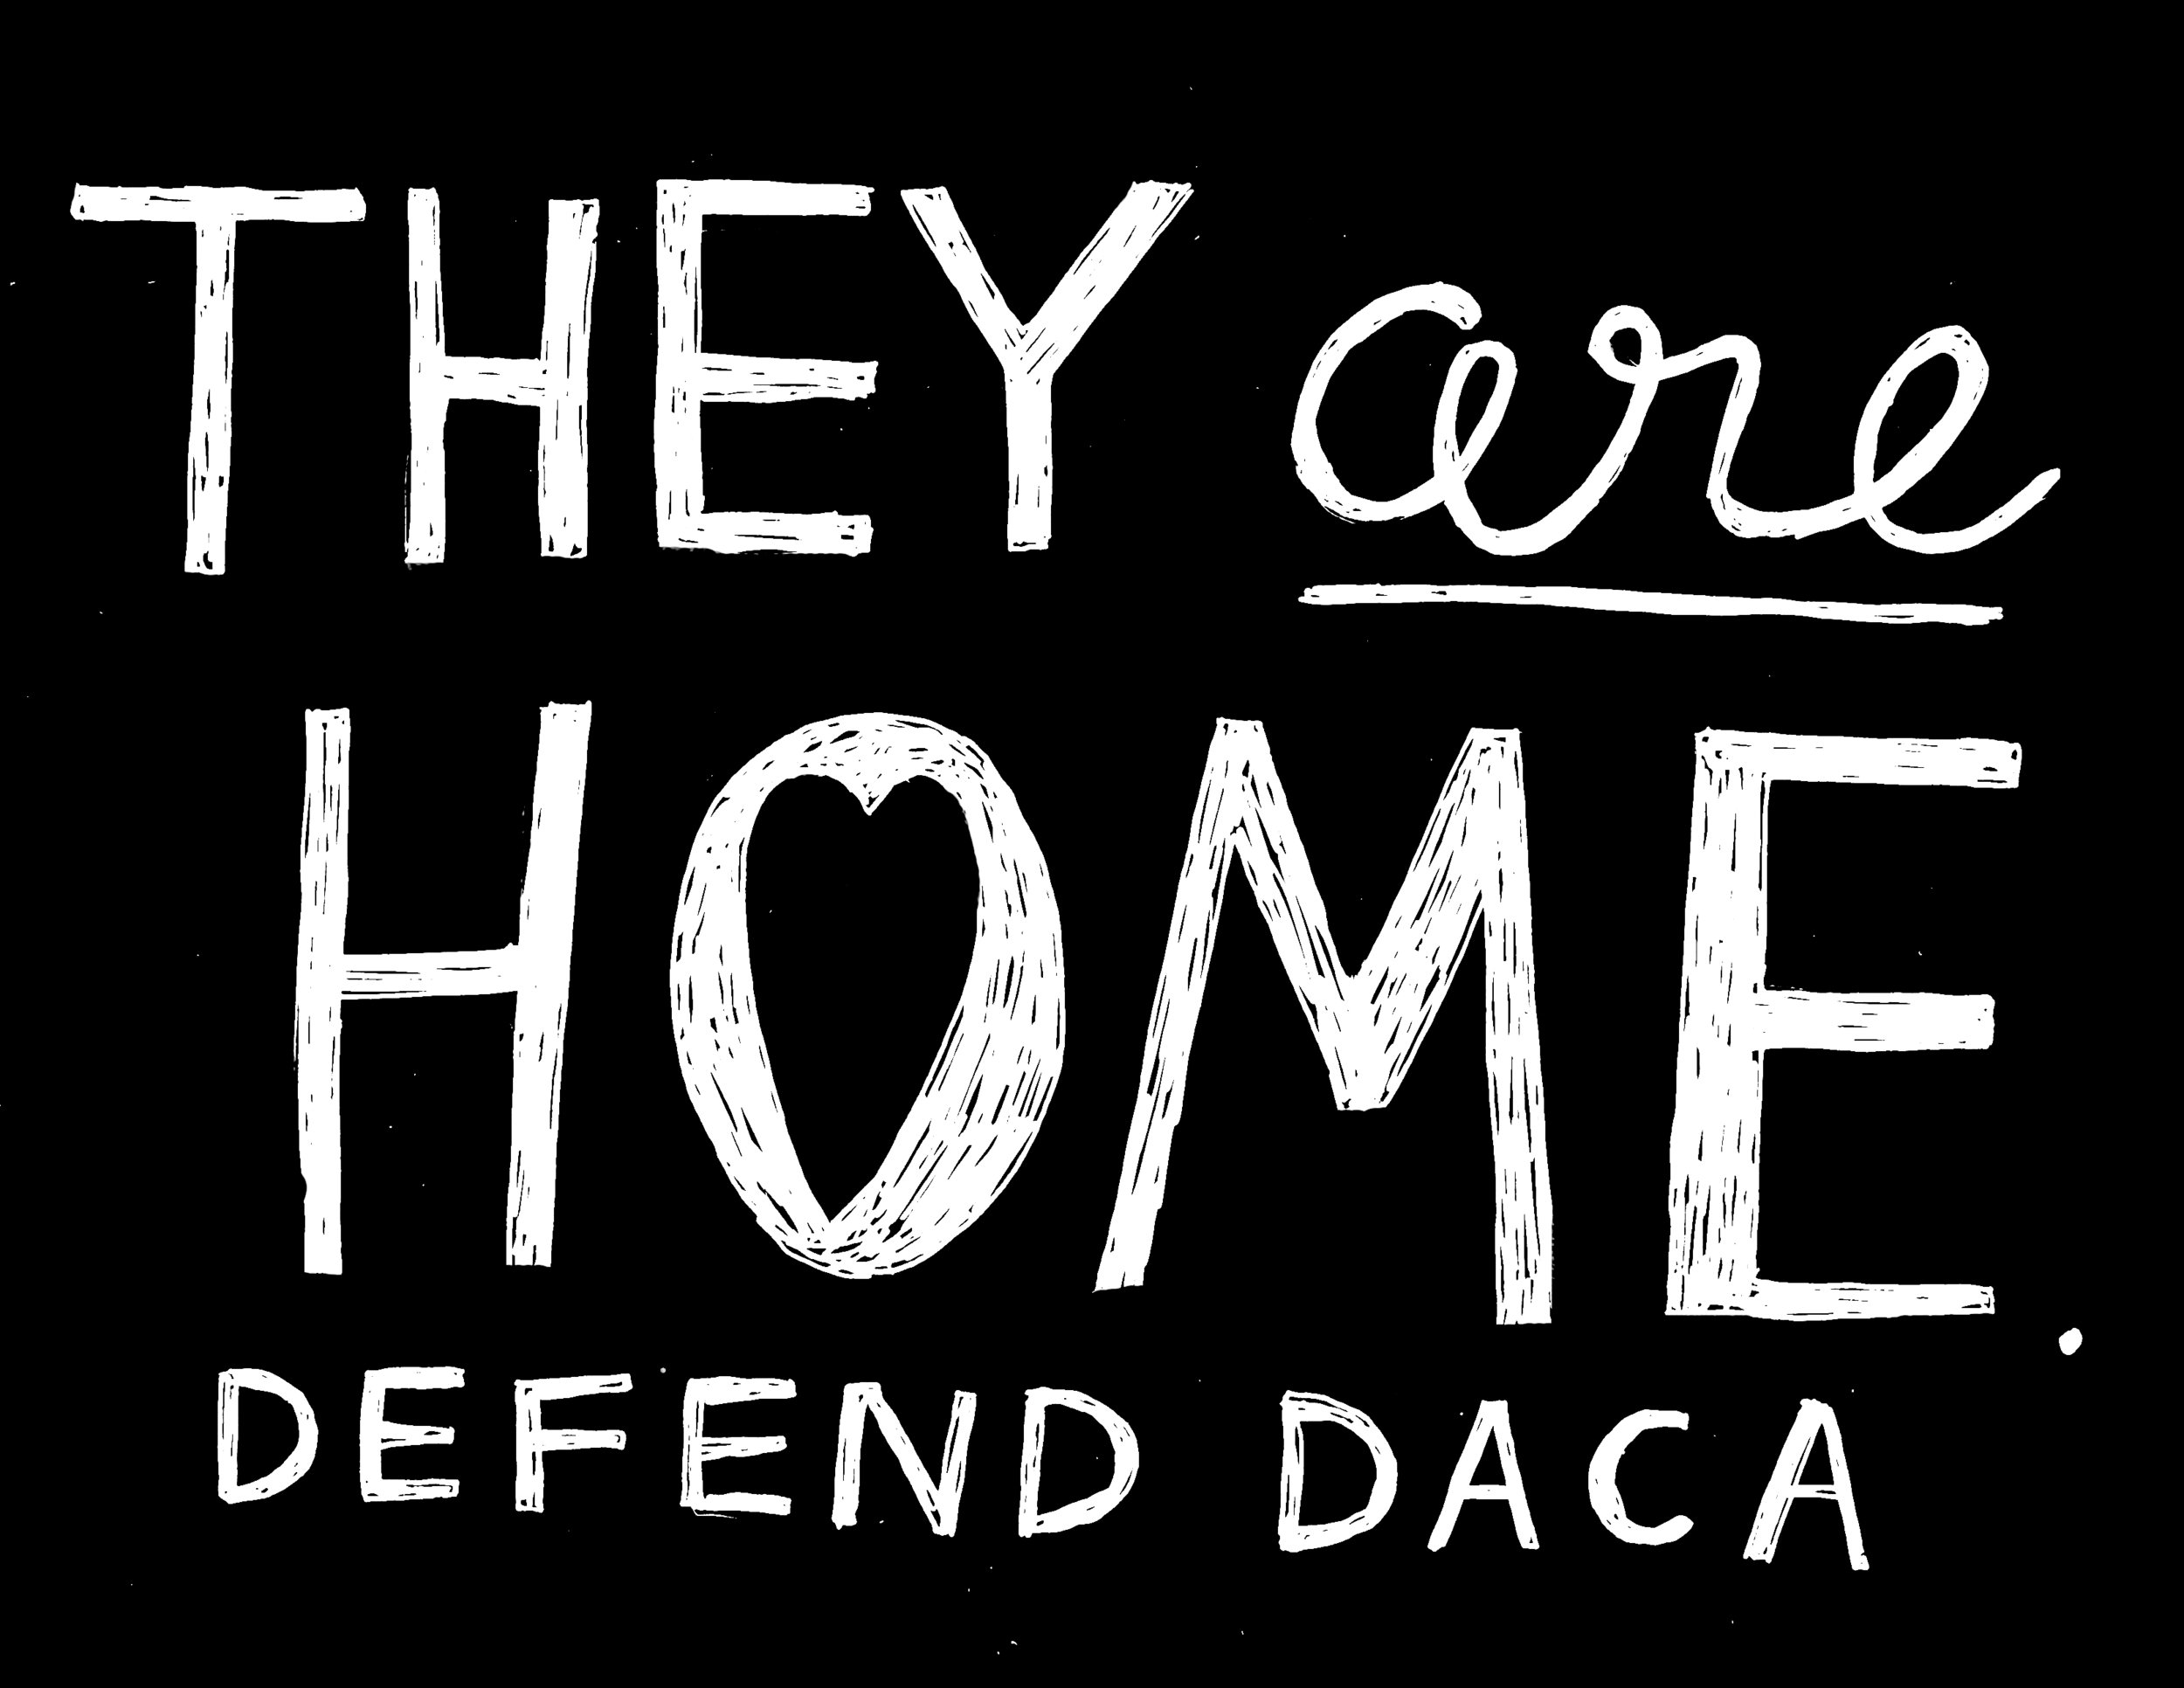 DACA_protest_home_inverse.jpg